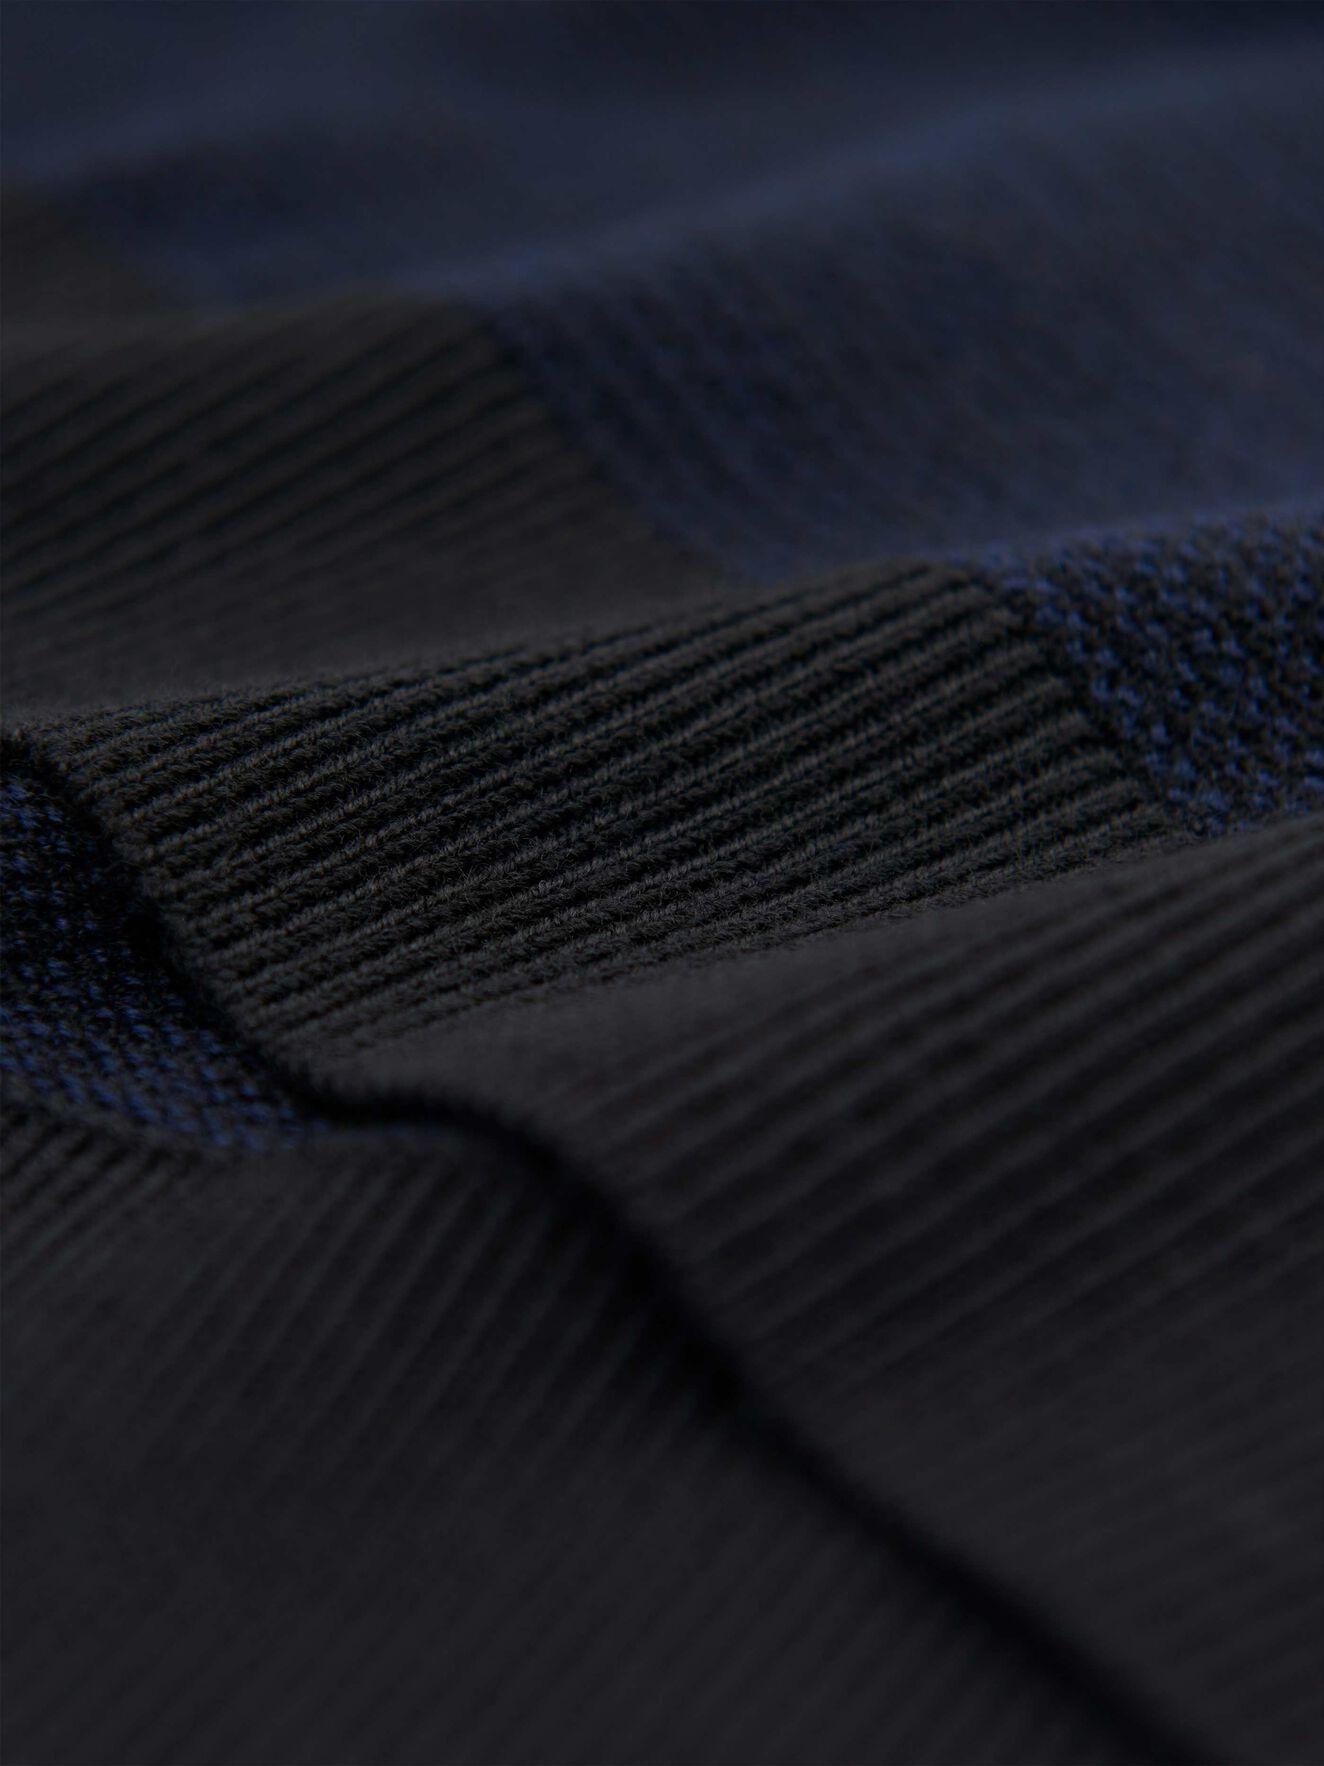 Nawaro Pullover in Black from Tiger of Sweden